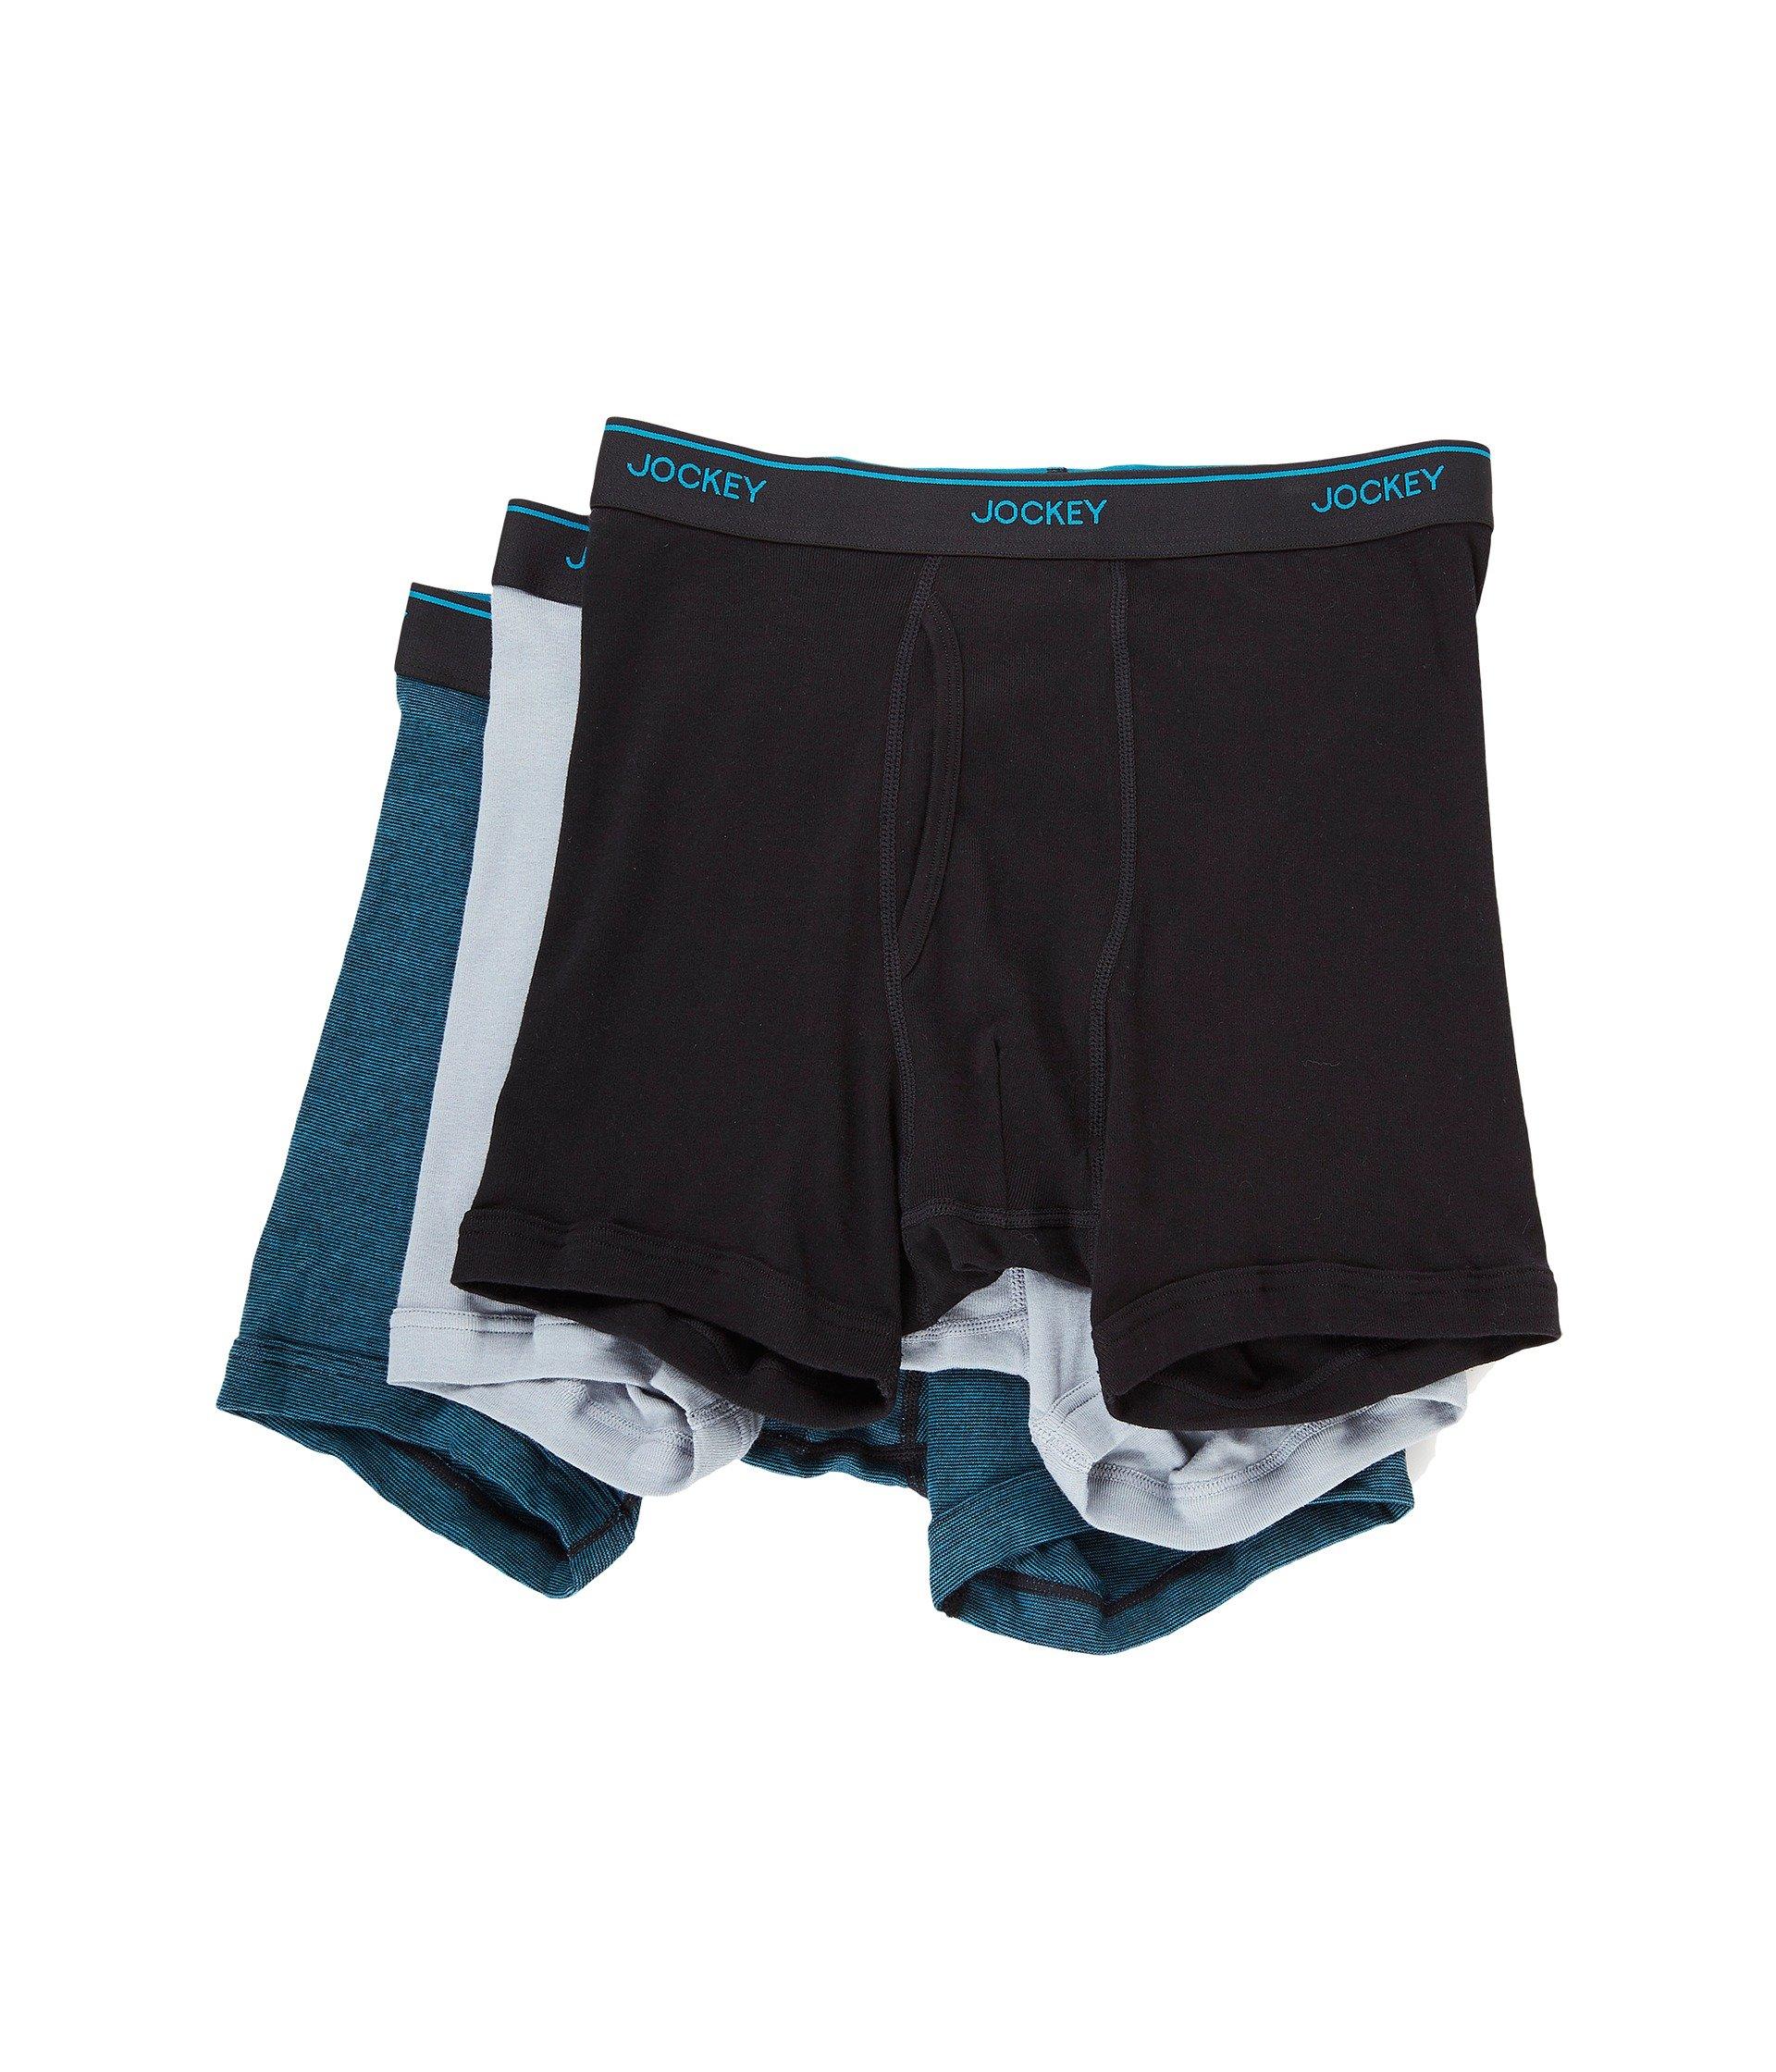 Line blue end silver Boxer End Staycool On Jockey Black Brief zP1xq8